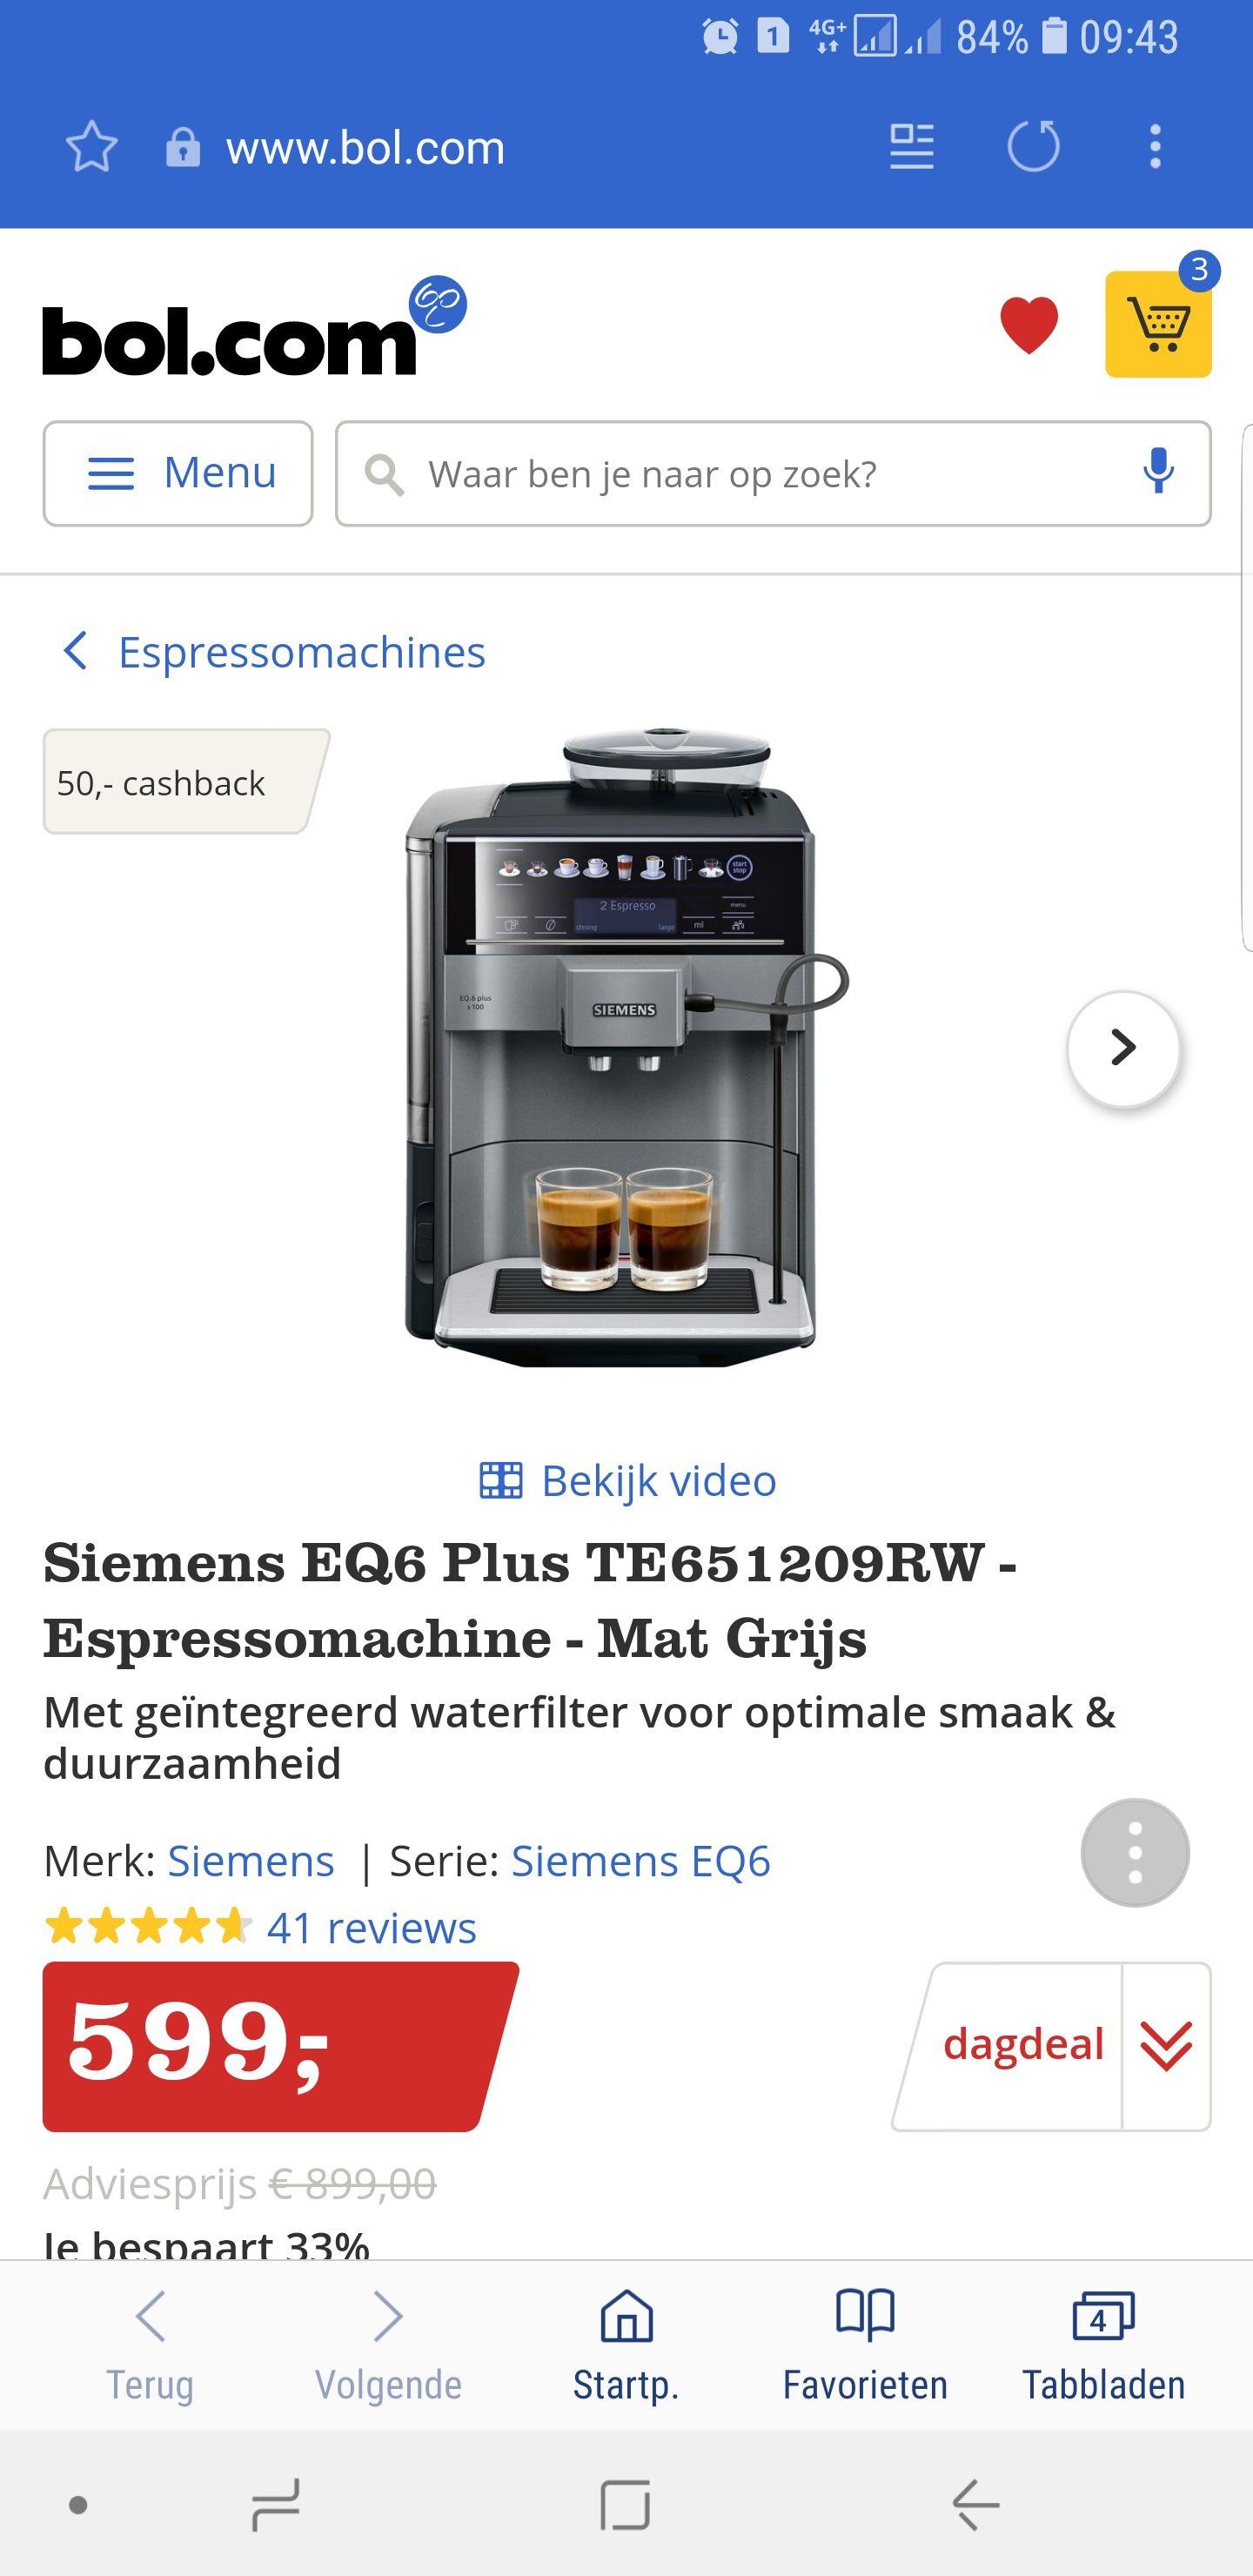 Siemens EQ6 Plus TE651209RW - Espressomachine - Mat Grijs + €50,- Cashback